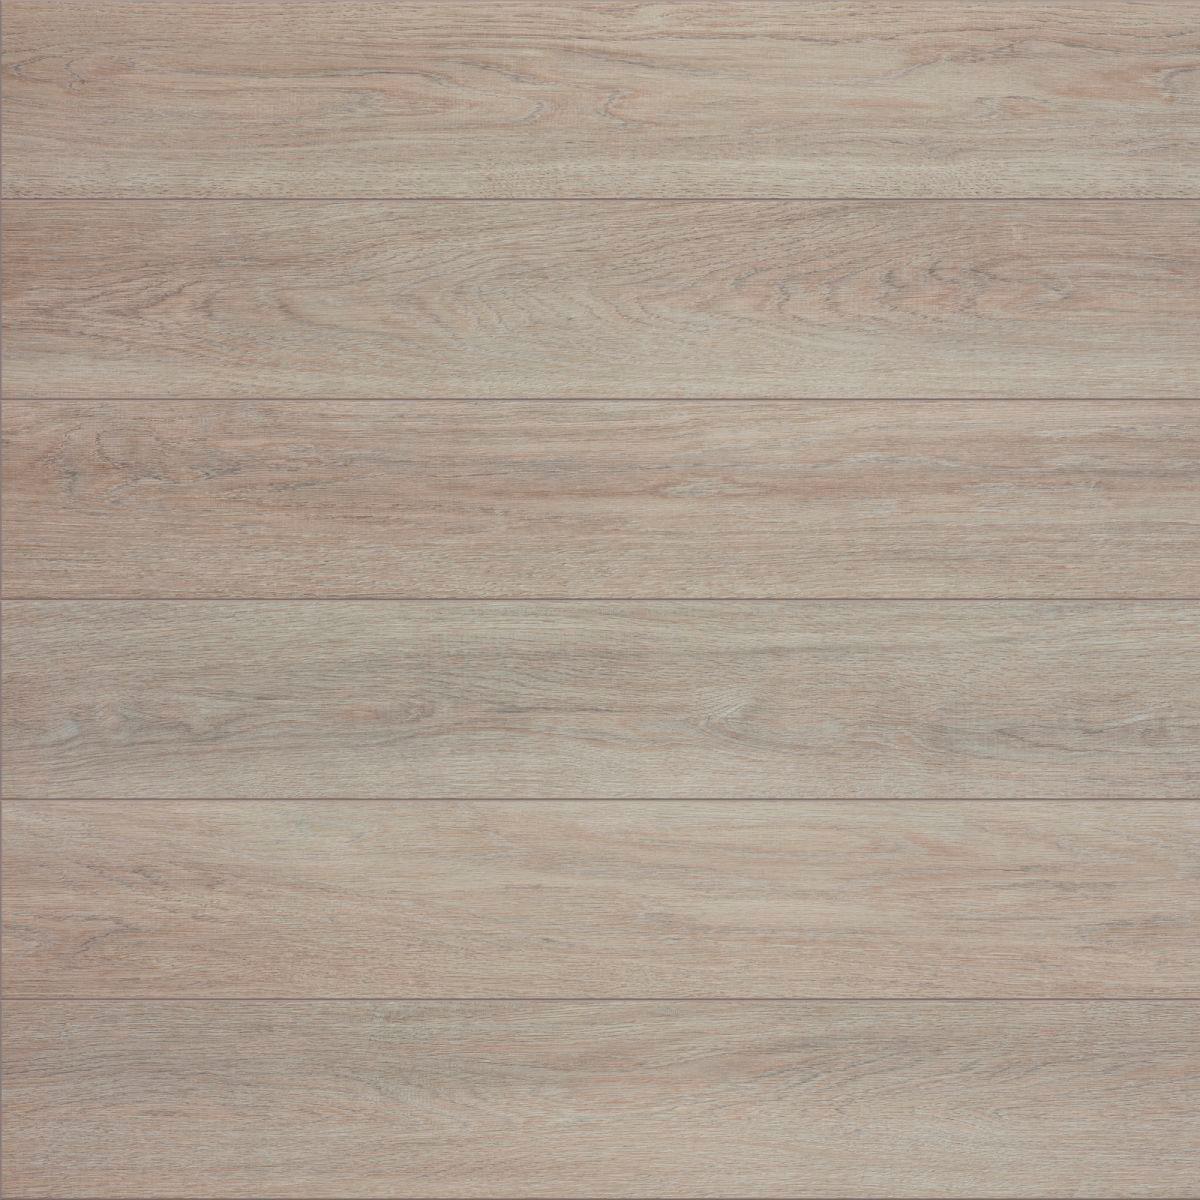 Classen Ламинат Pool 833-4 52562 Дуб grey brown